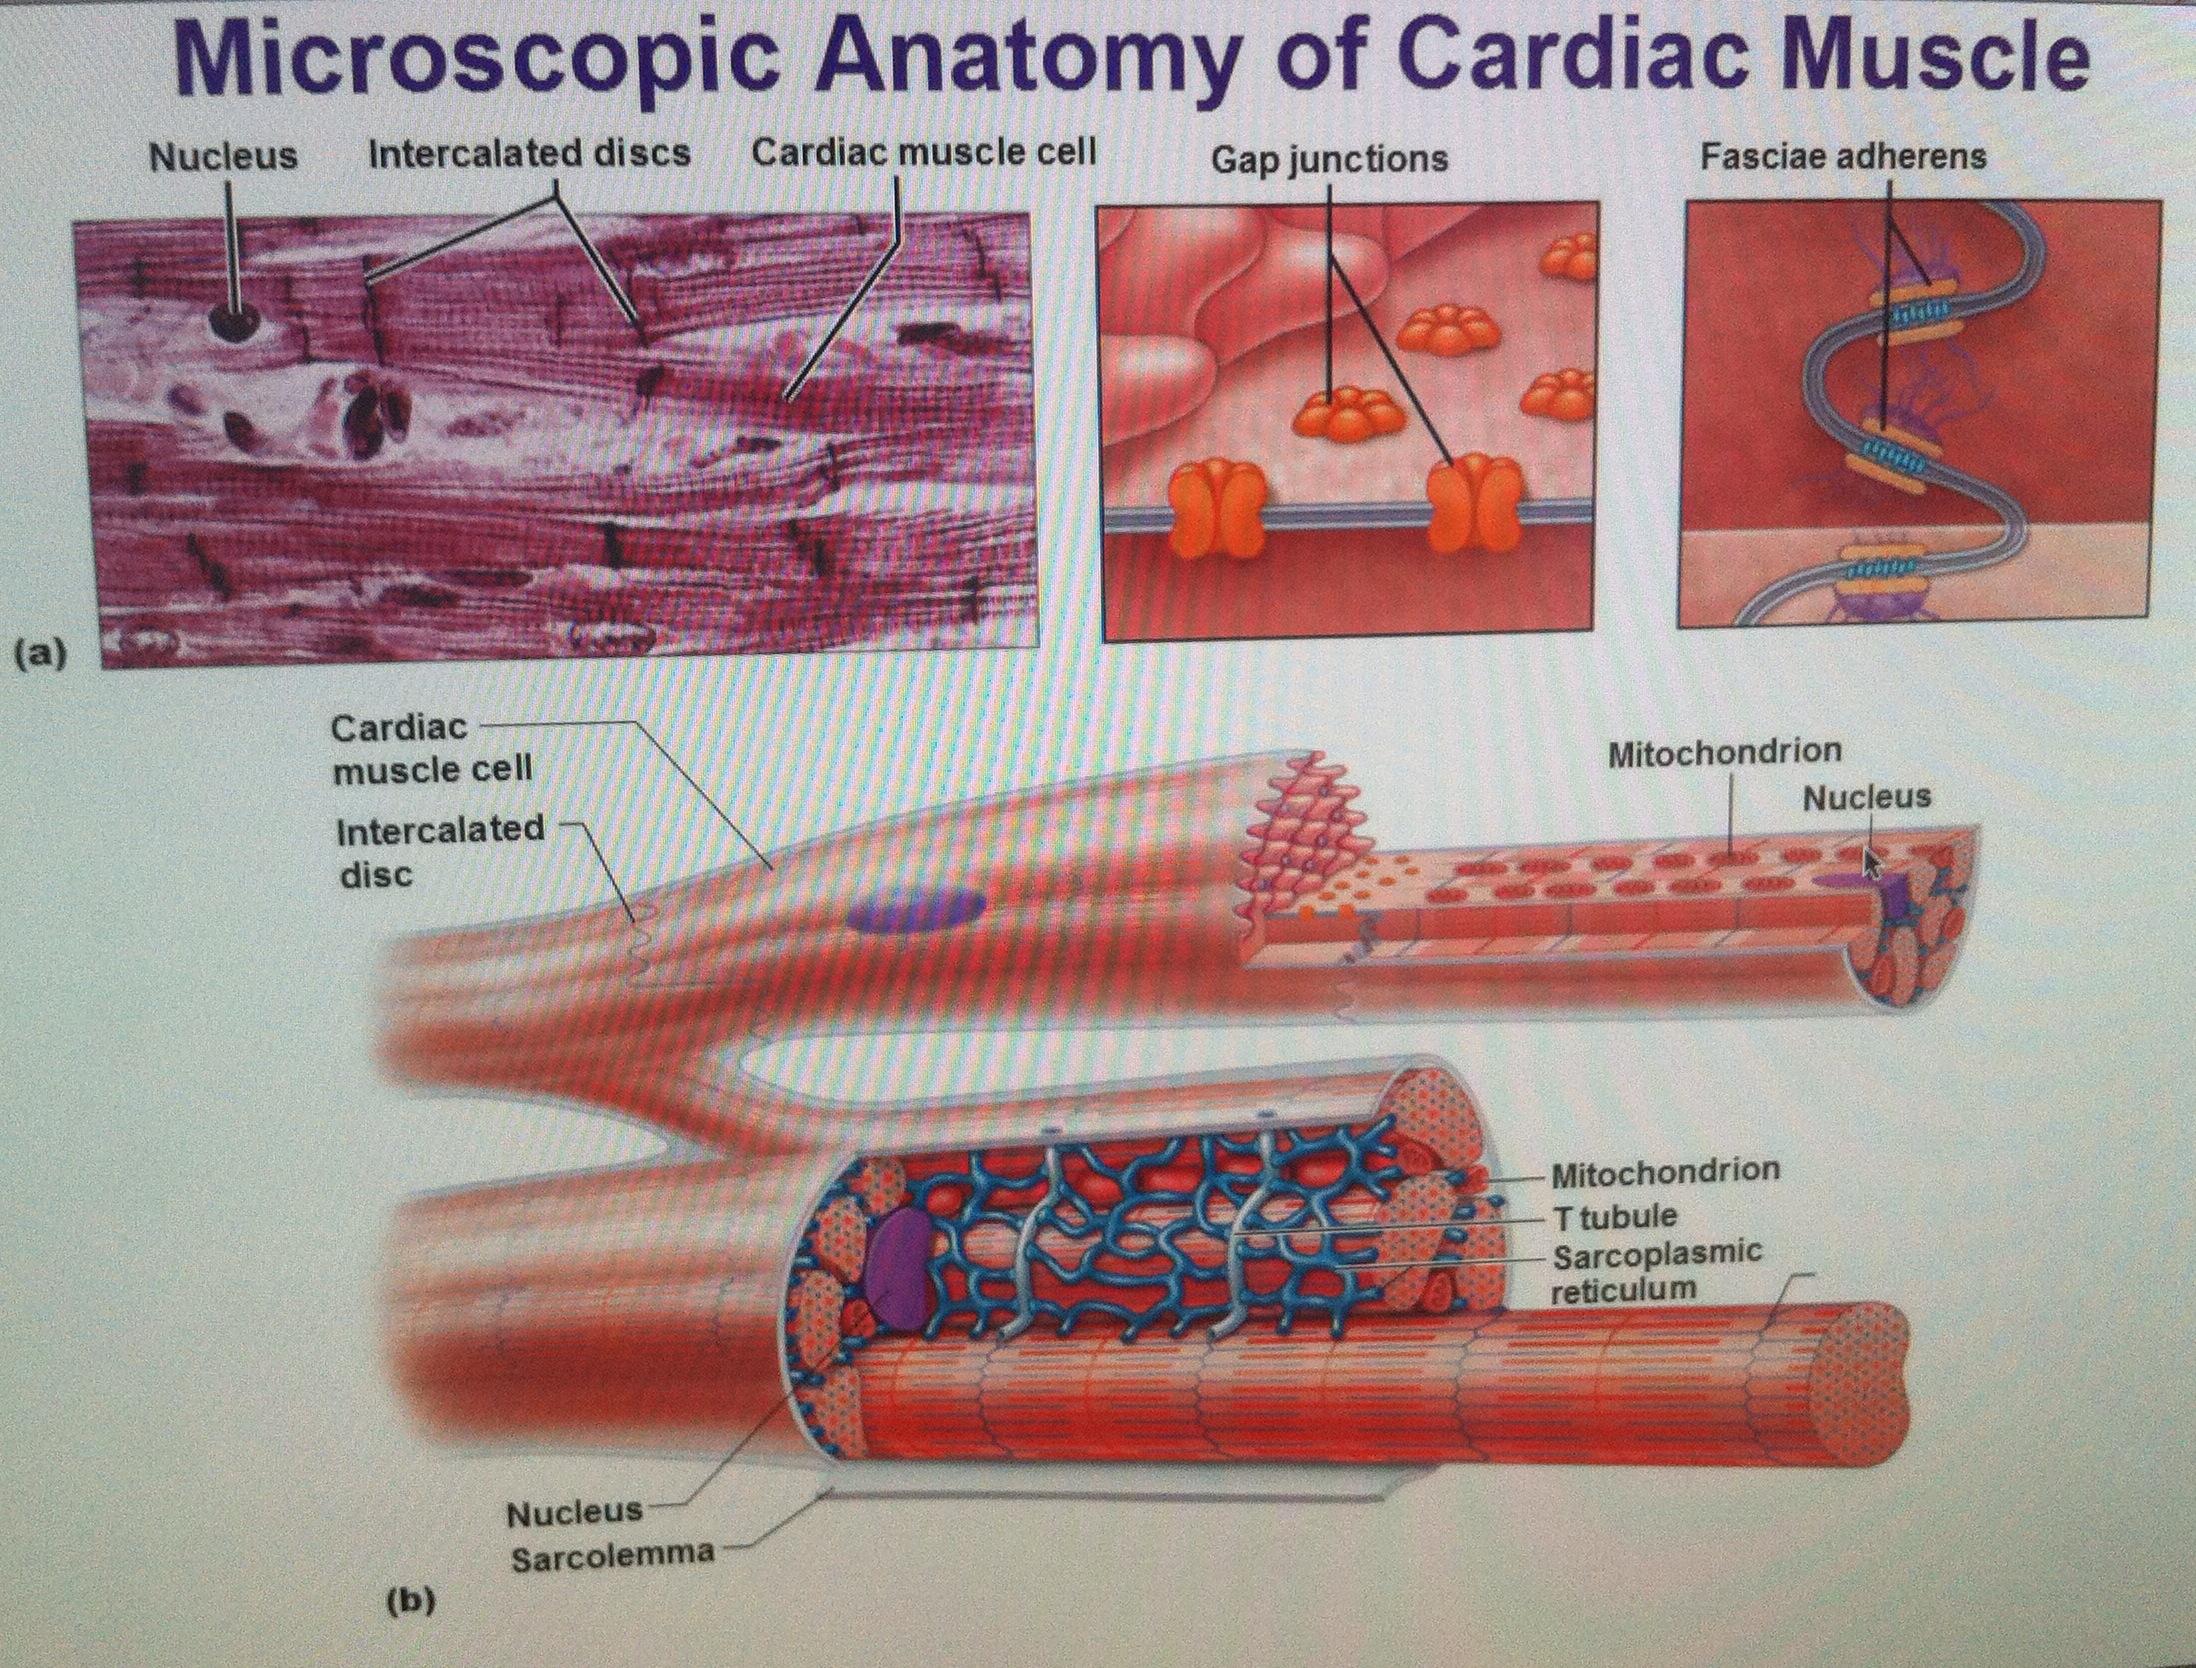 Microscopic anatomy of cardiac muscle – OCR A Level Biology